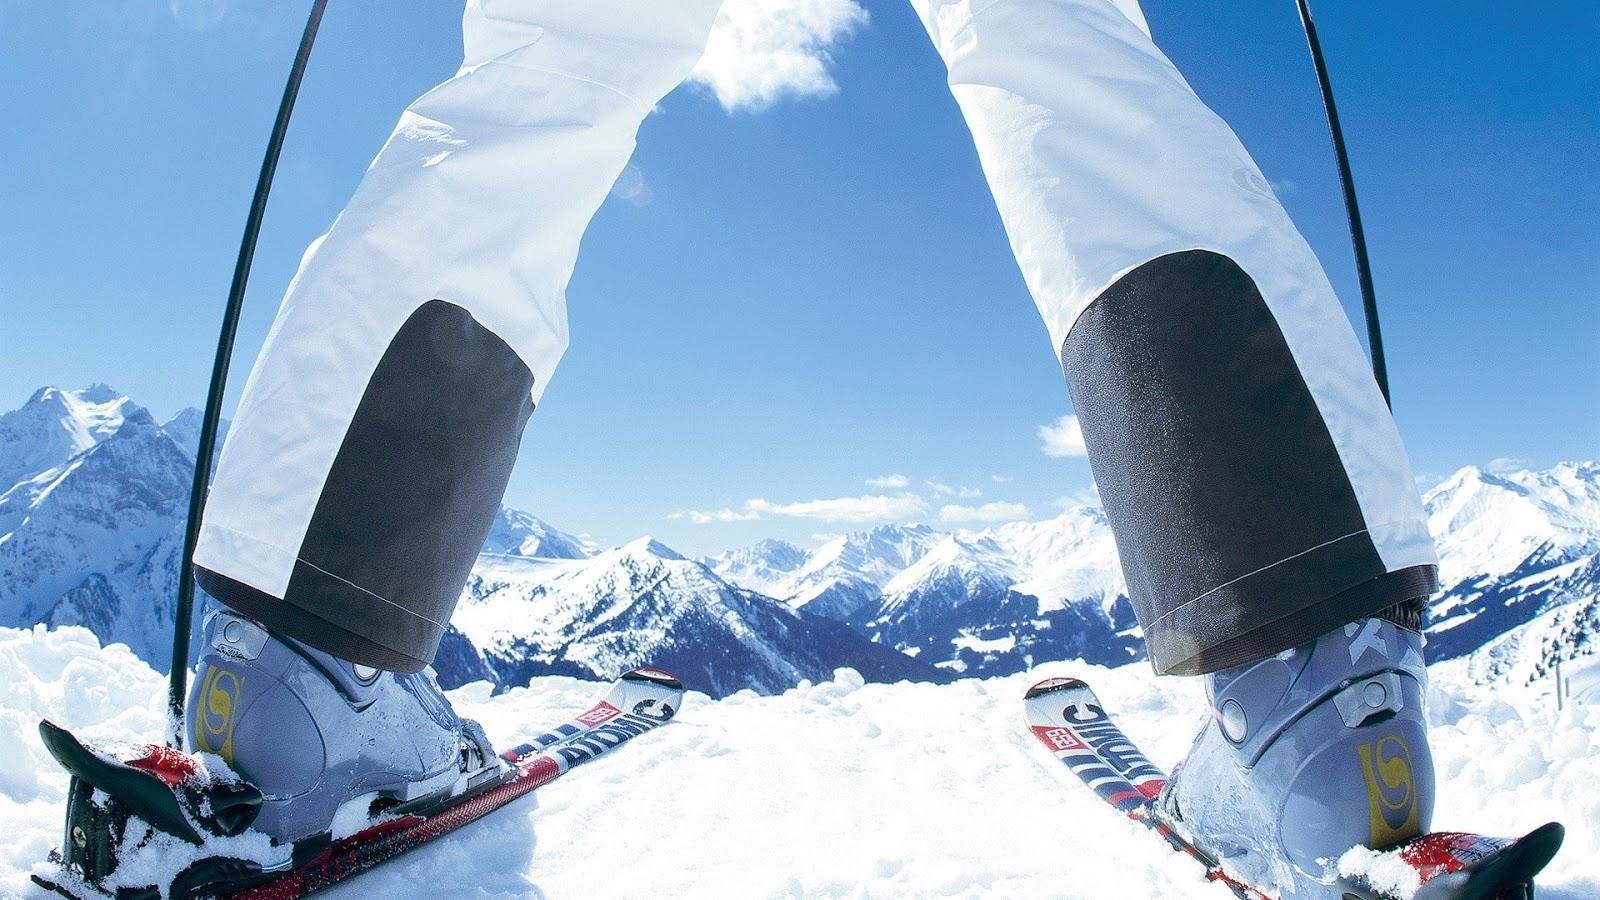 Ski wallpaper wallpaper for desktop - Ski wallpaper ...